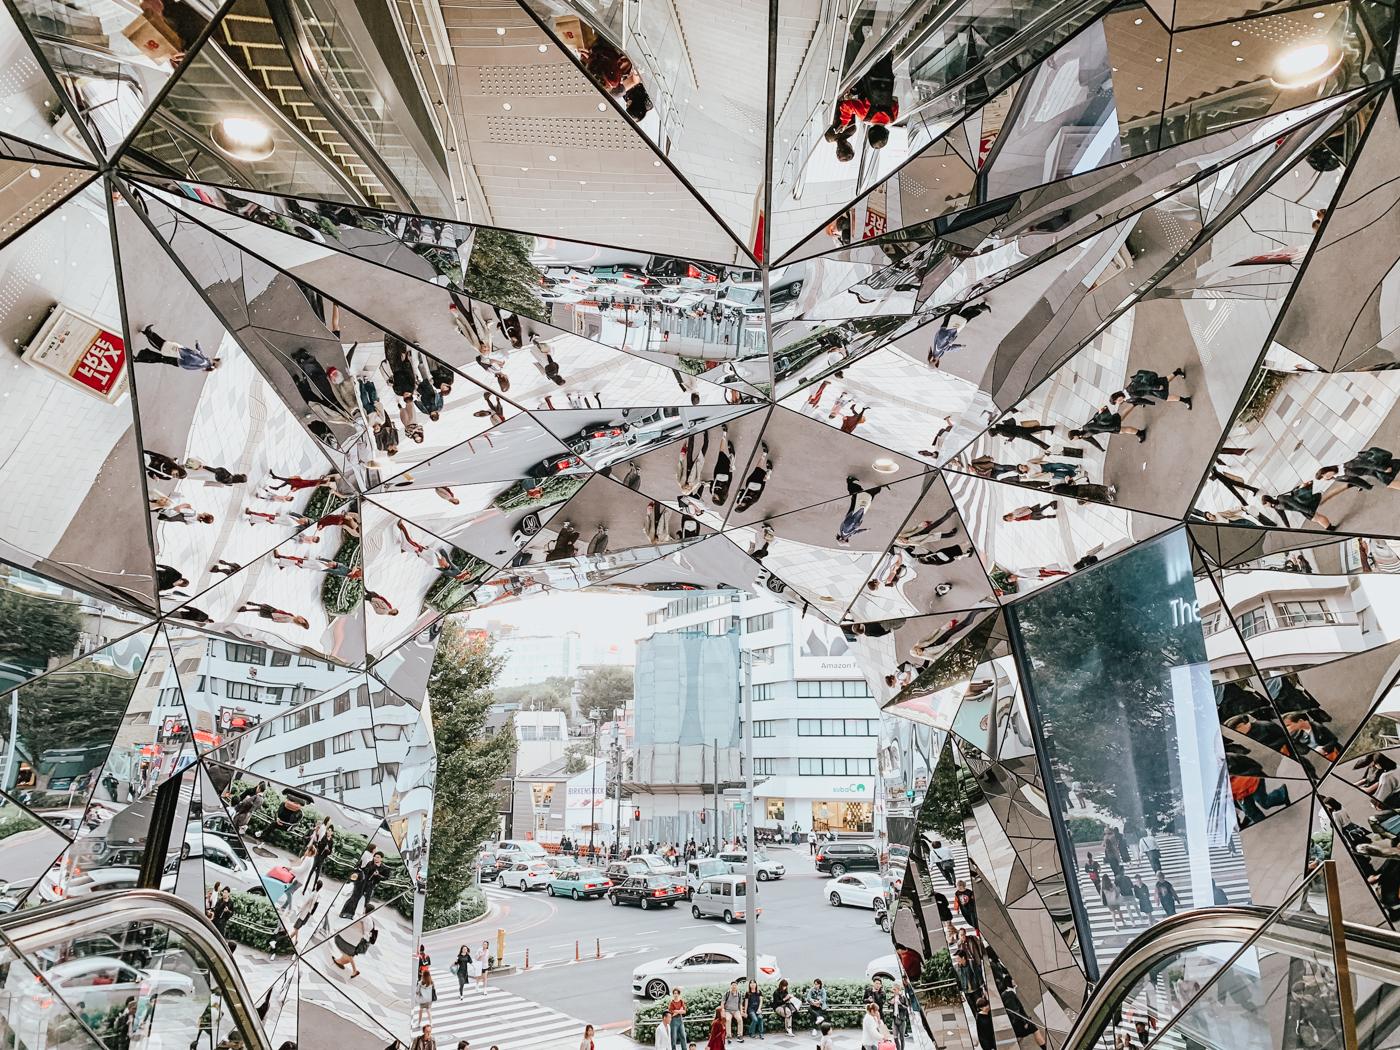 Tokyo Plaza Omotesando Harajuku - Mirrored escalator entrance